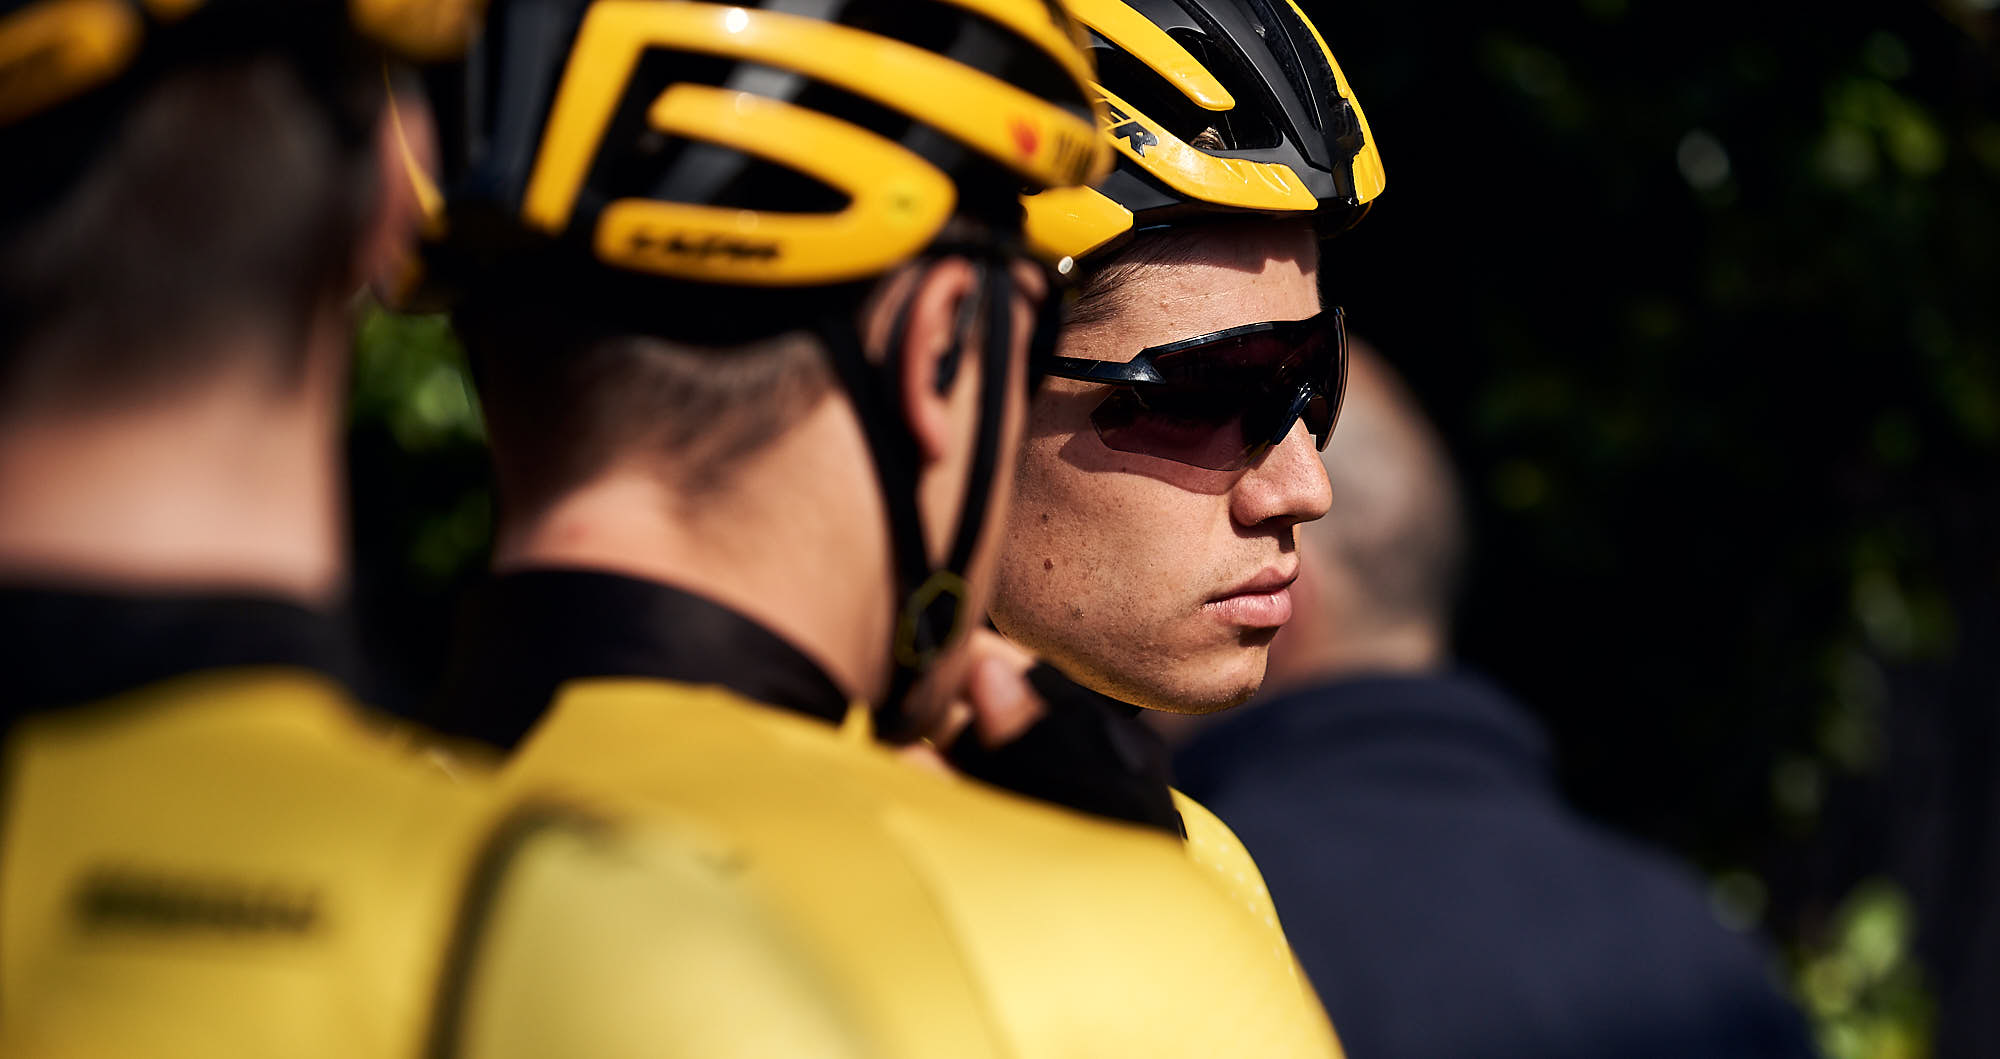 Jumbo-Visma rider Wout van Aert just before Strade Bianche